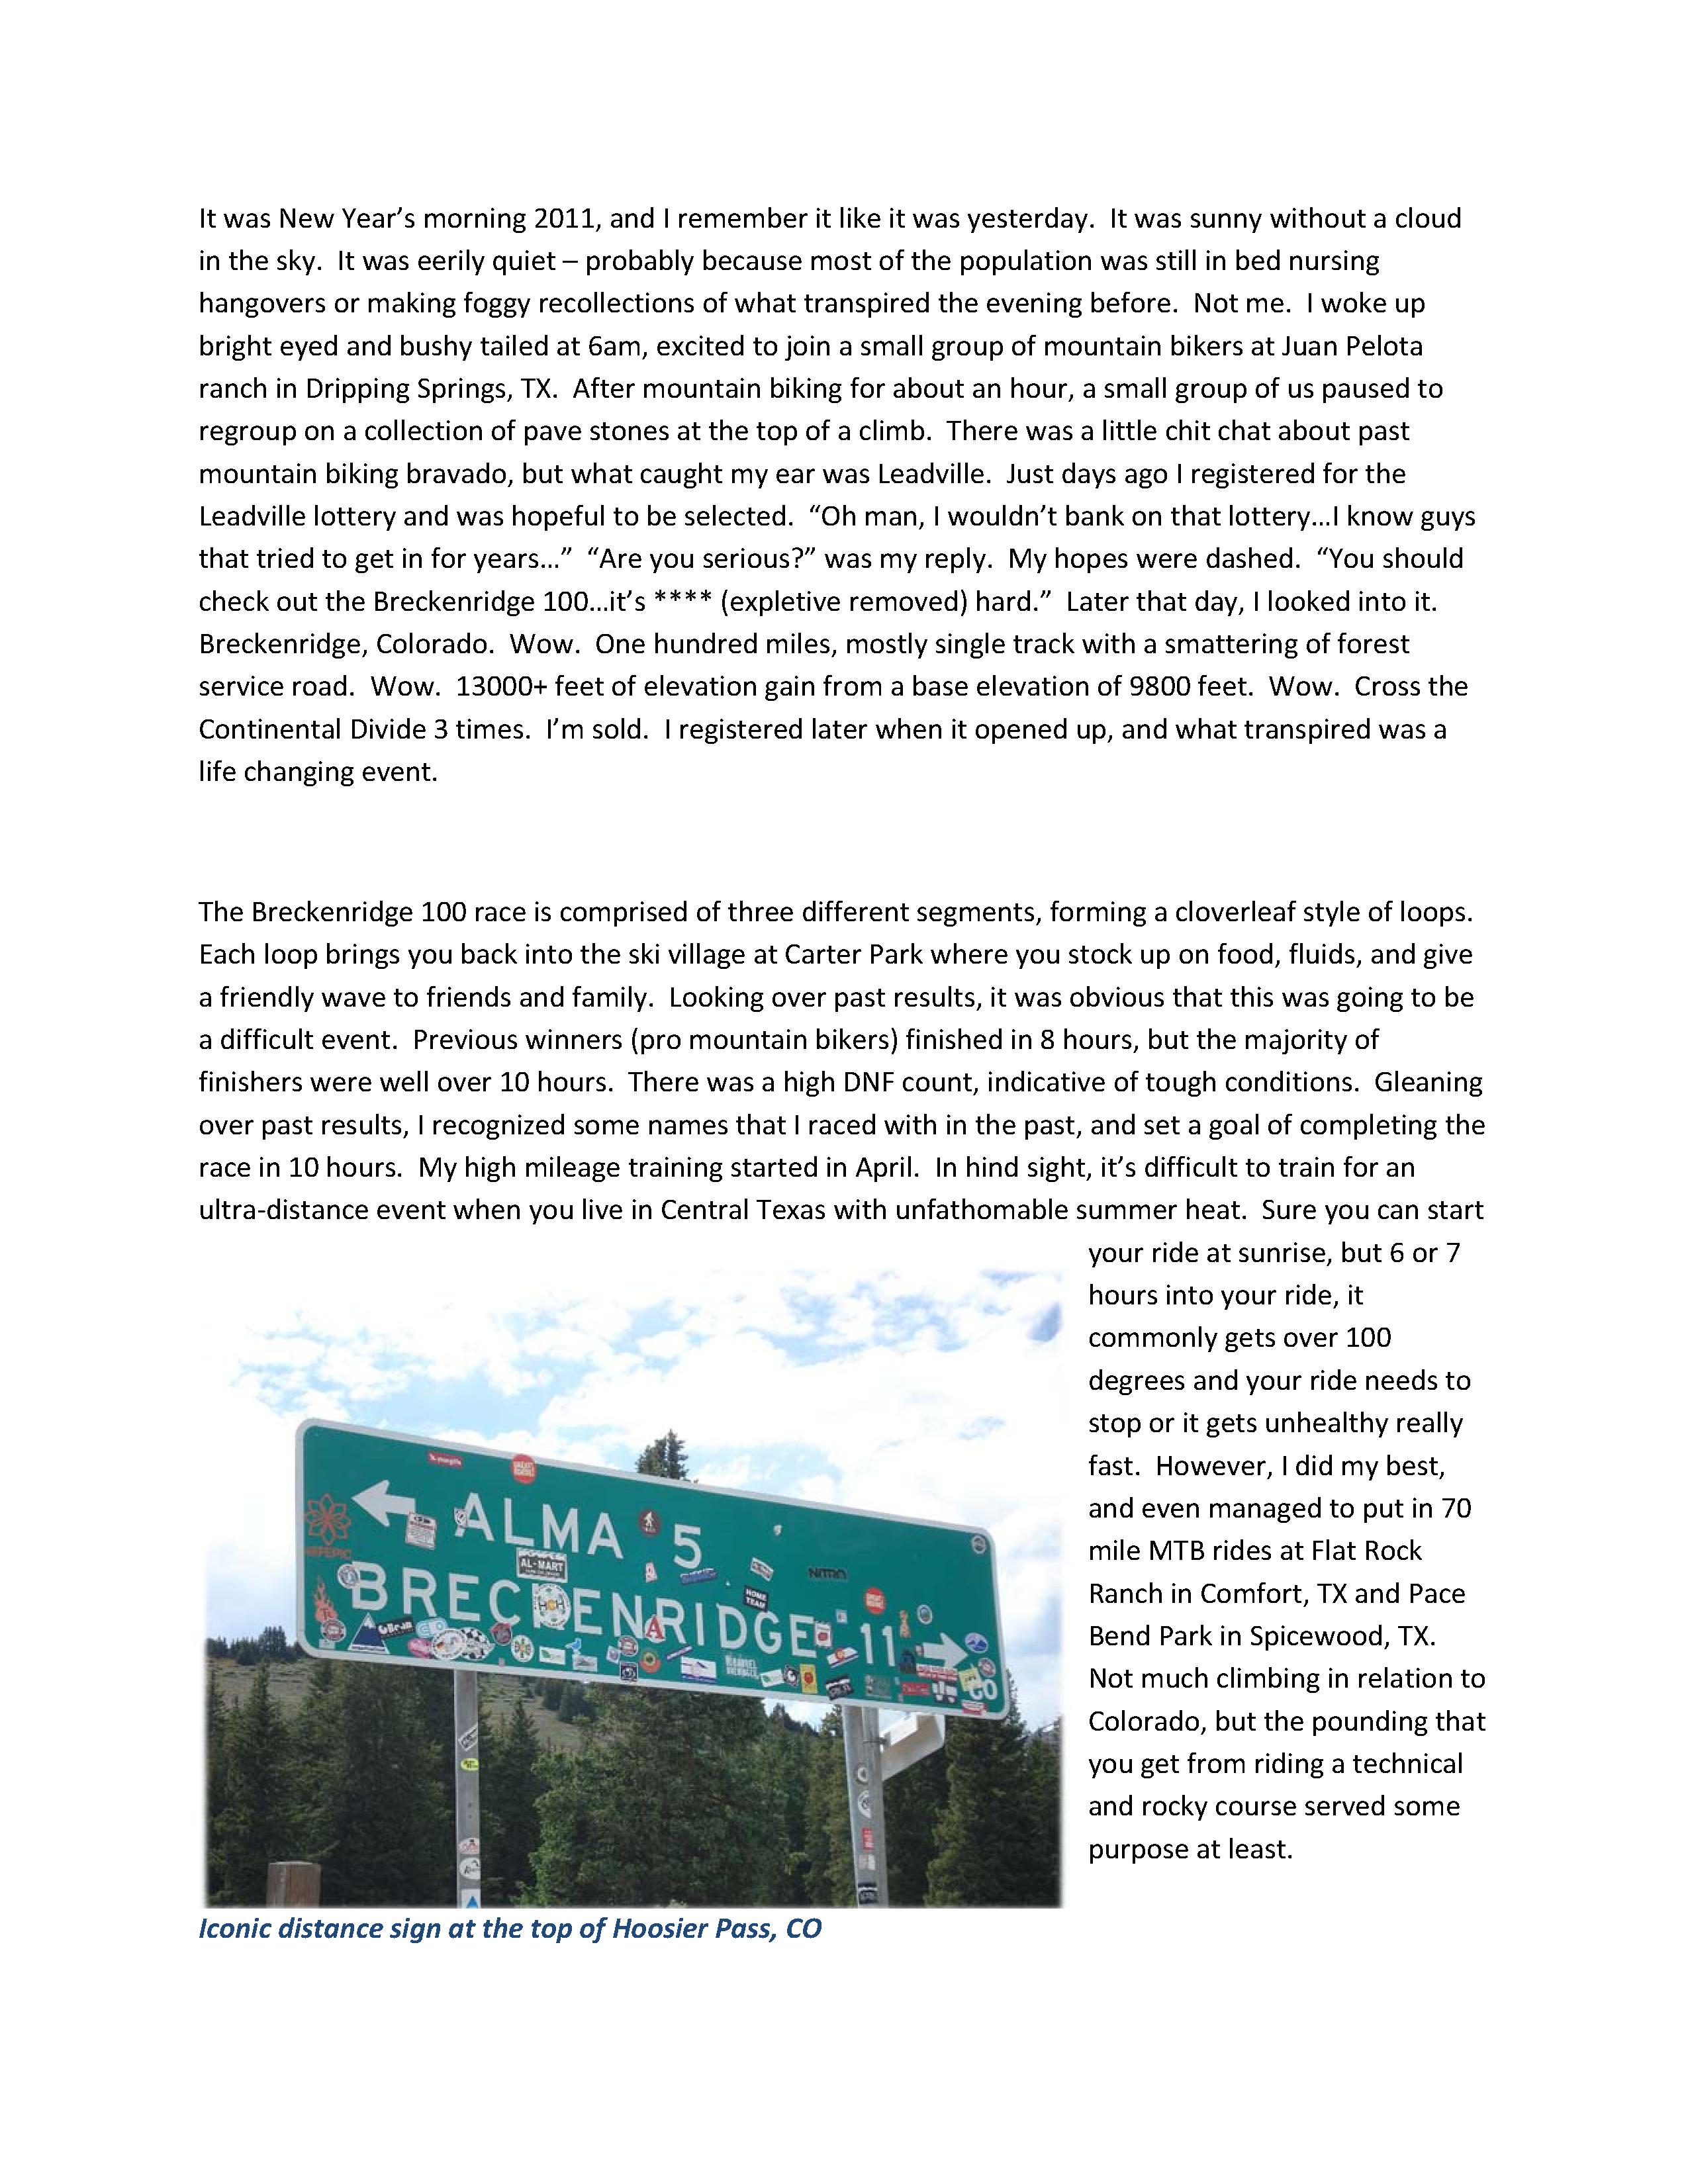 Breckenridge 100 Race Report